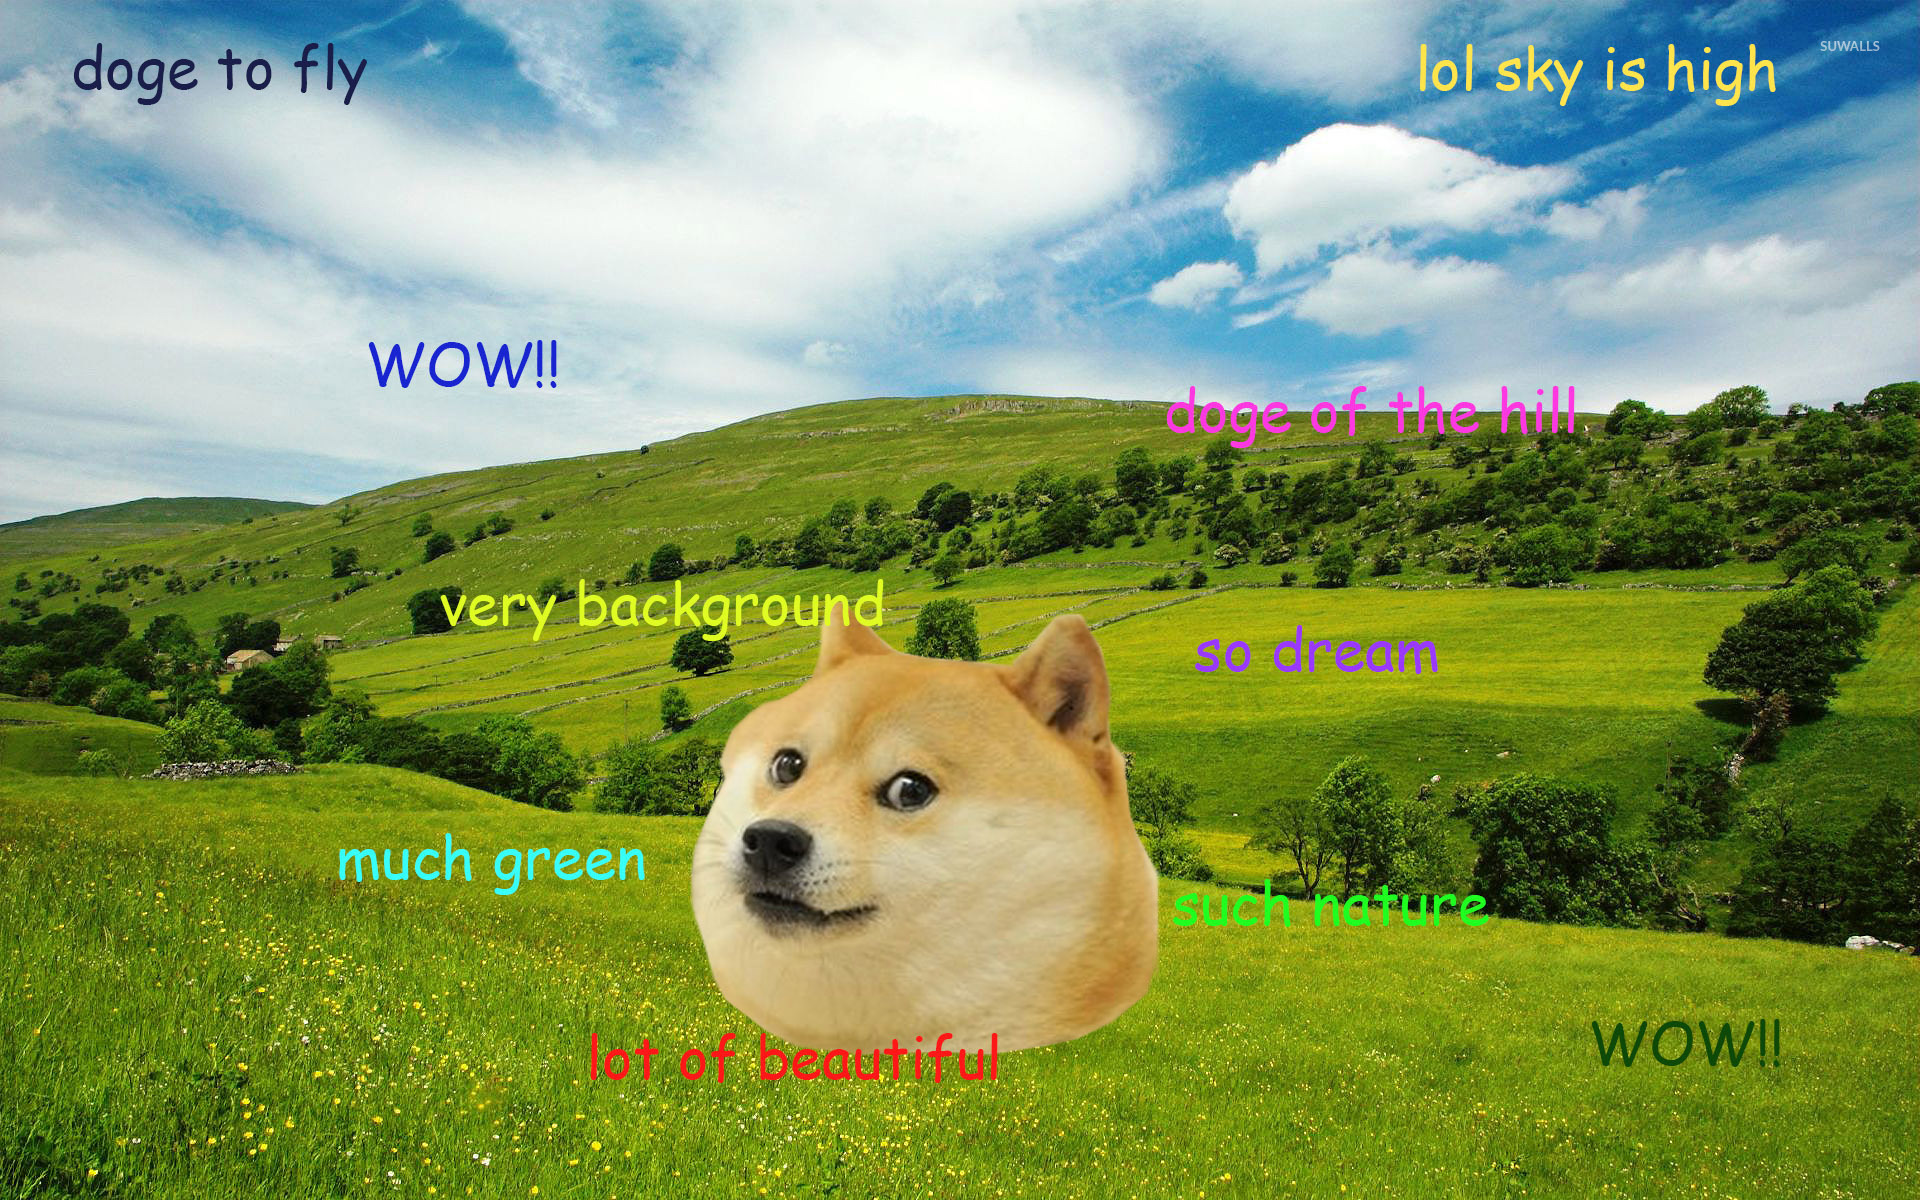 doge 27300 1920x1200 doge wallpaper meme wallpapers 27299,Doge Meme Wallpaper